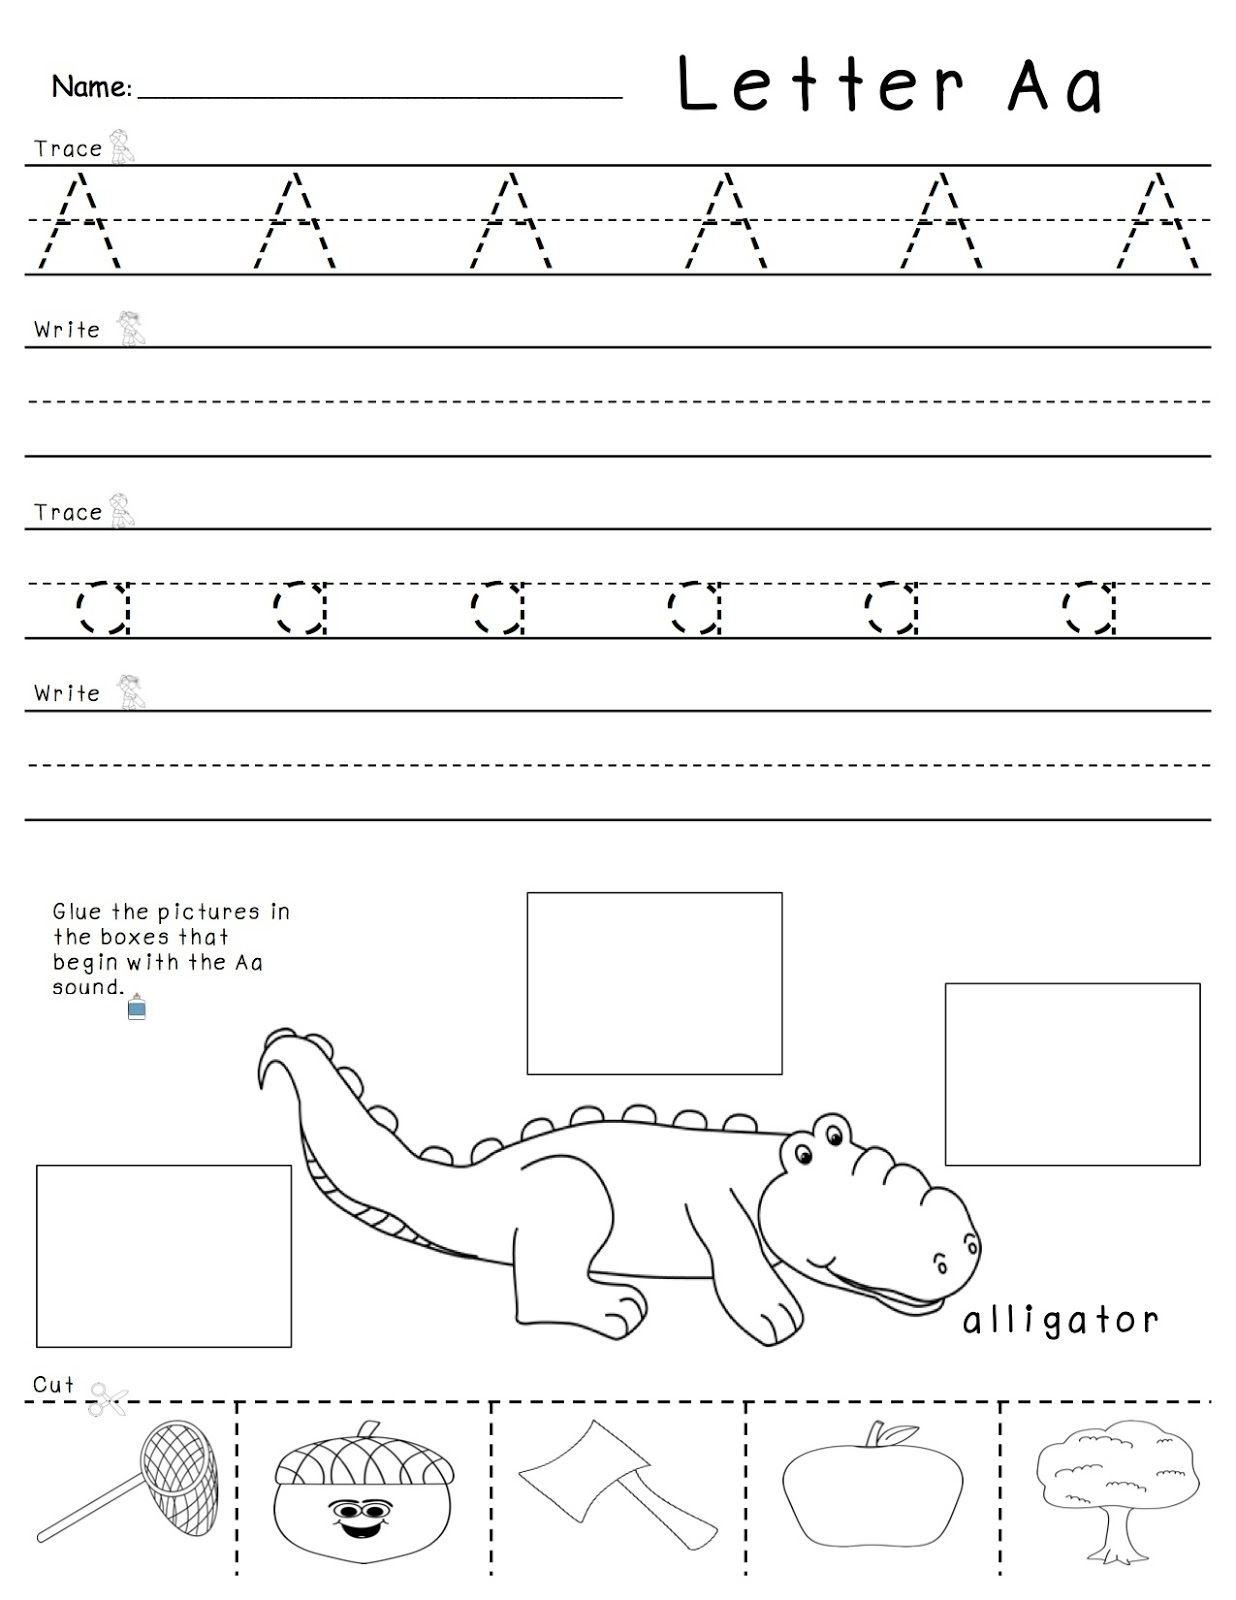 traceable letter a for kindergarten